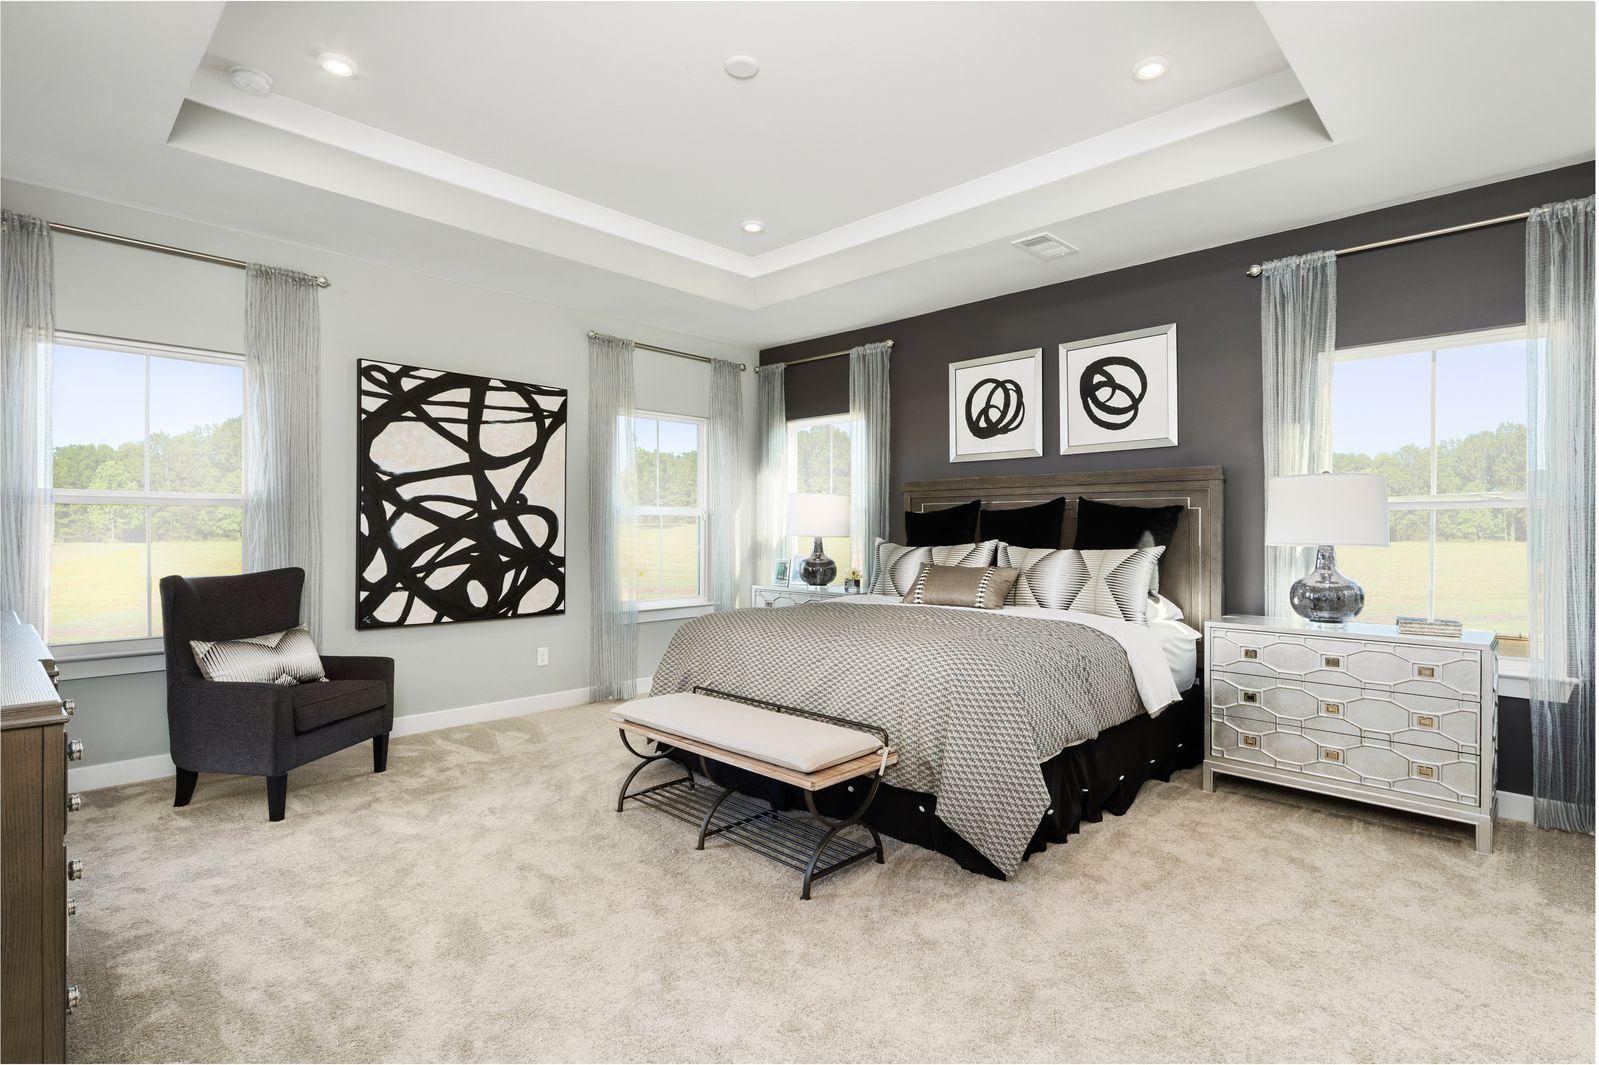 Bedroom featured in the Savannah By Ryan Homes in Sussex, DE